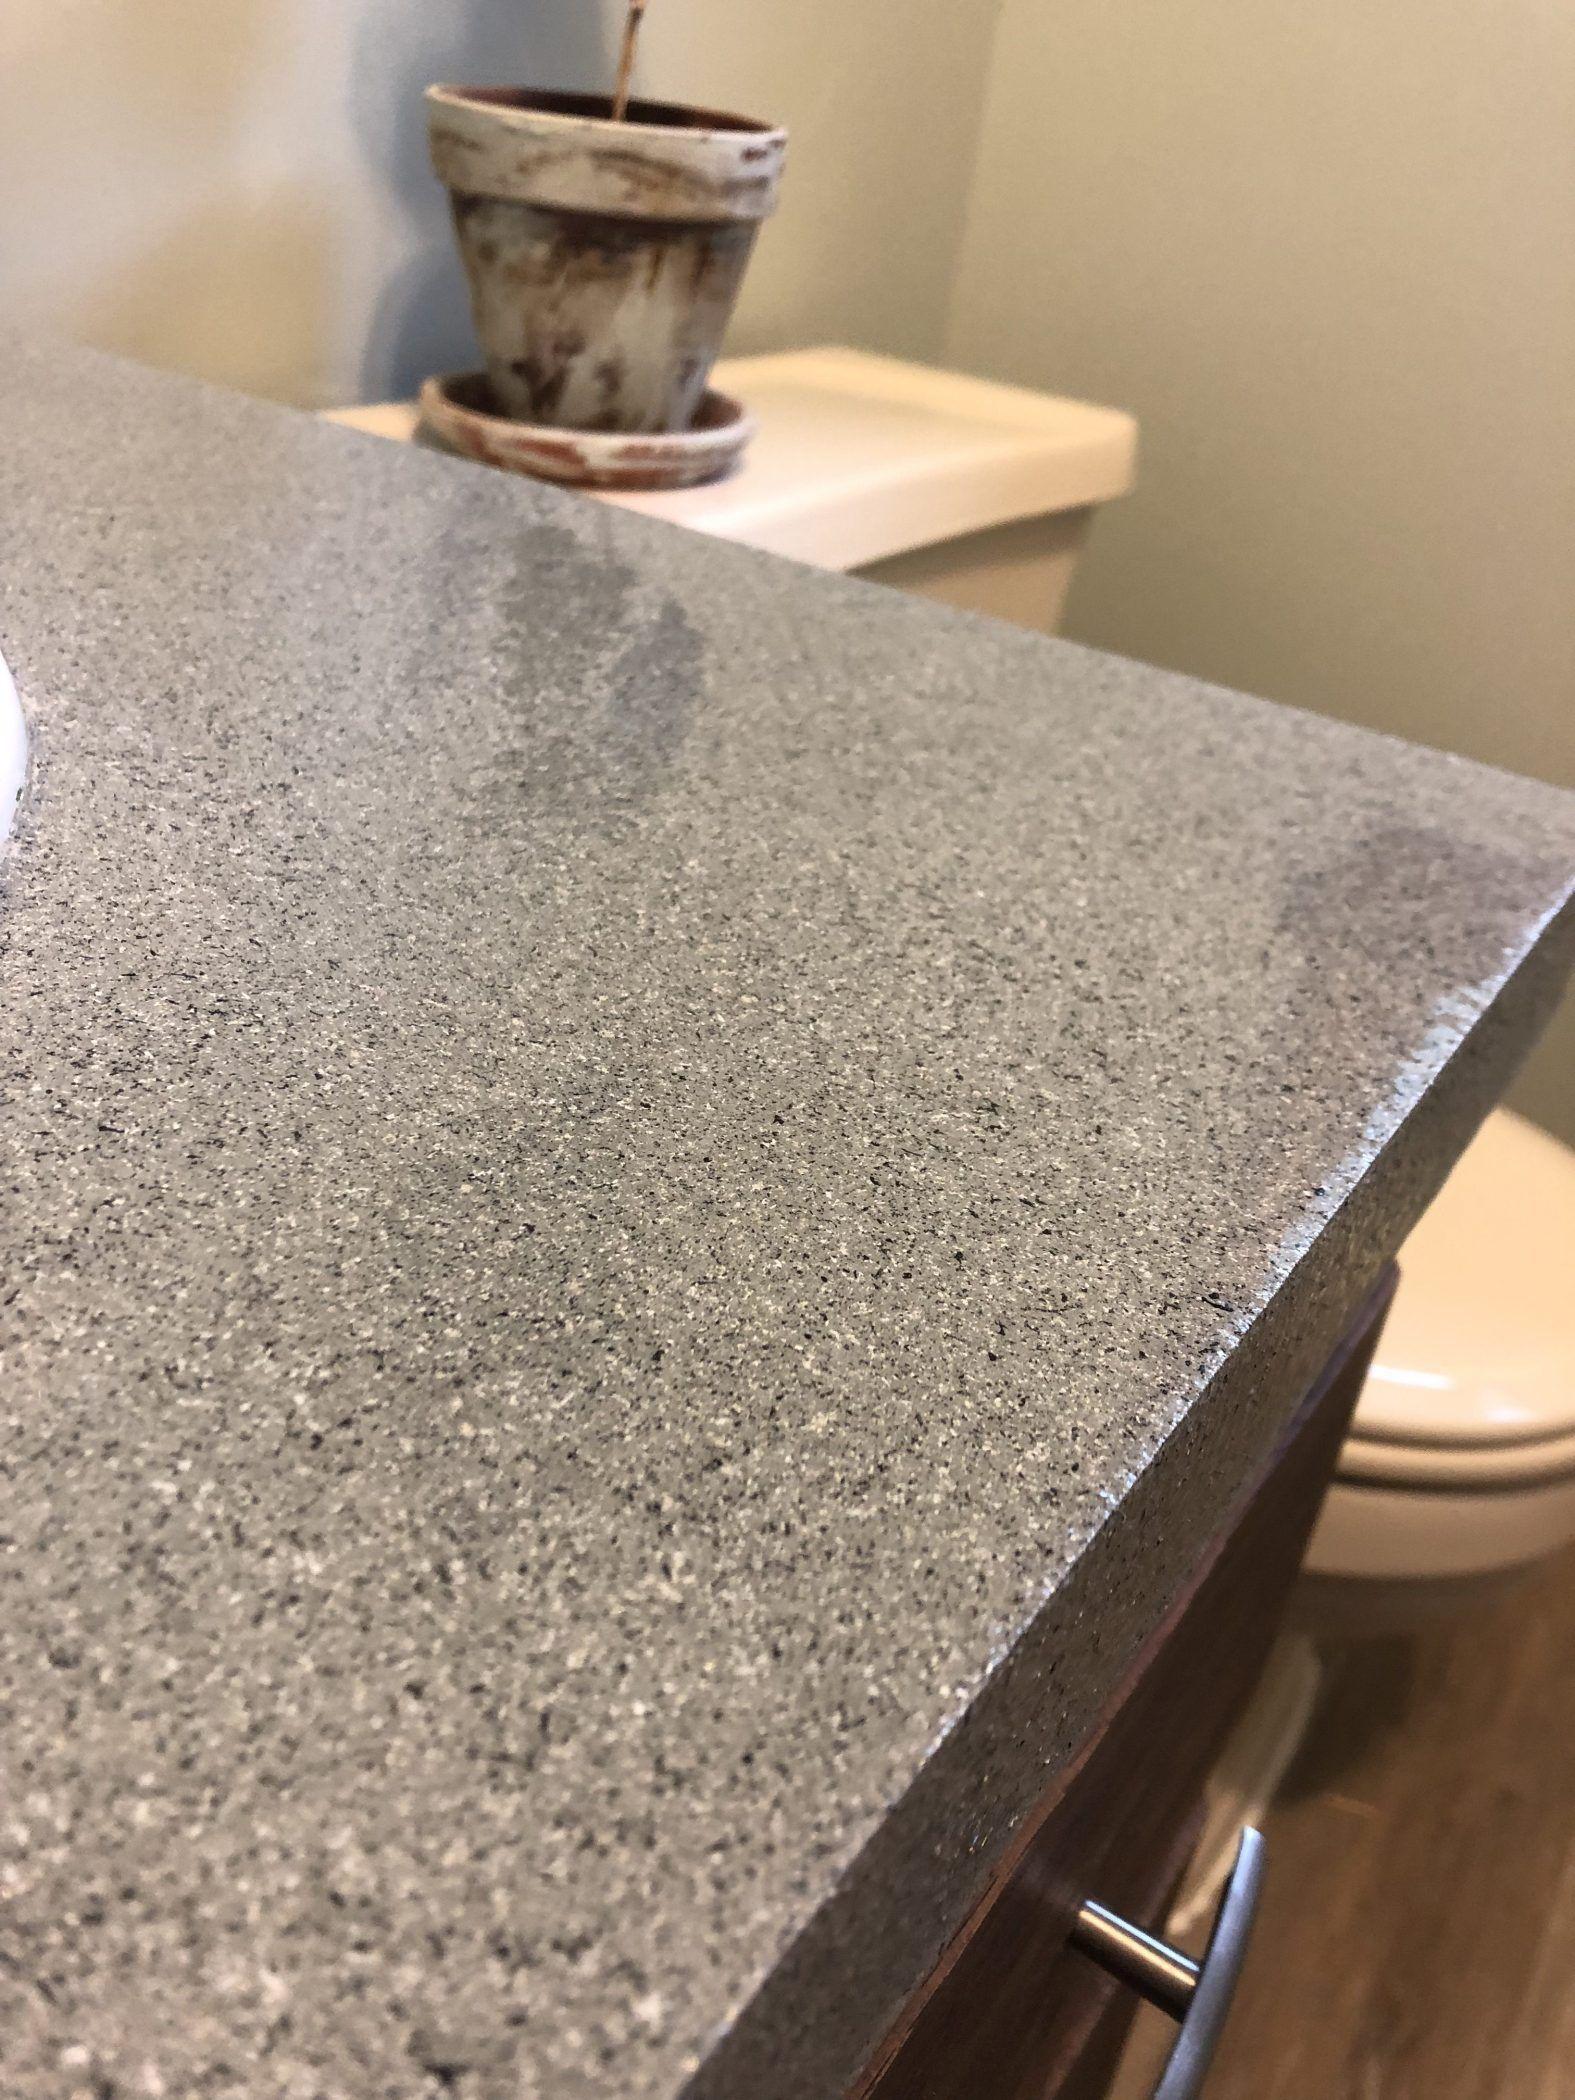 Diy Spray Paint Countertops